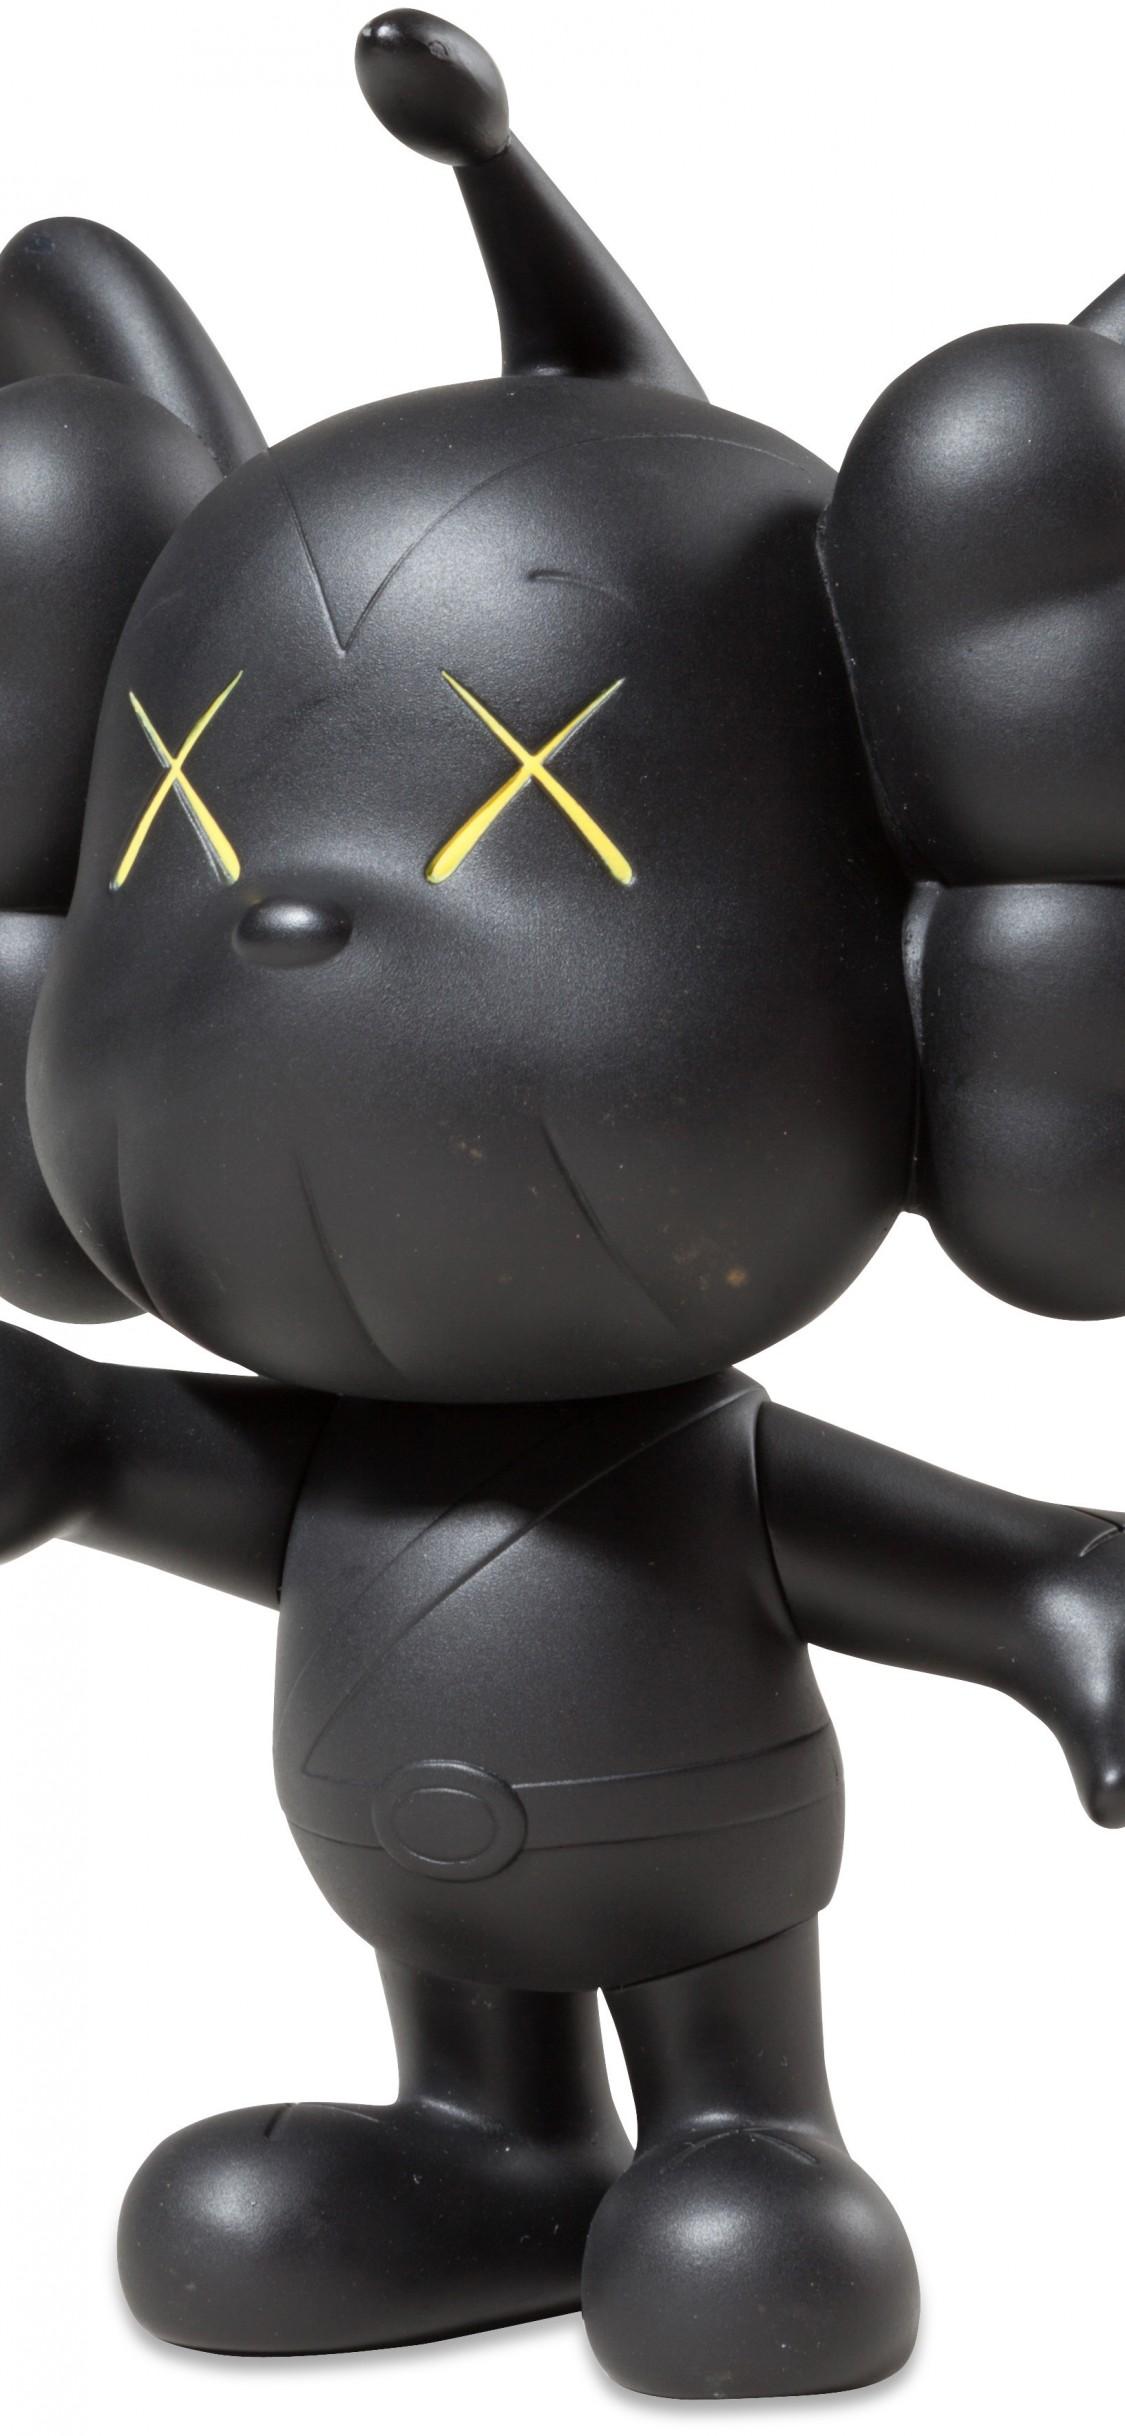 Download Kaws Bearbricks Kaws Bape Wallpaper   Figurine Hd 1125x2436